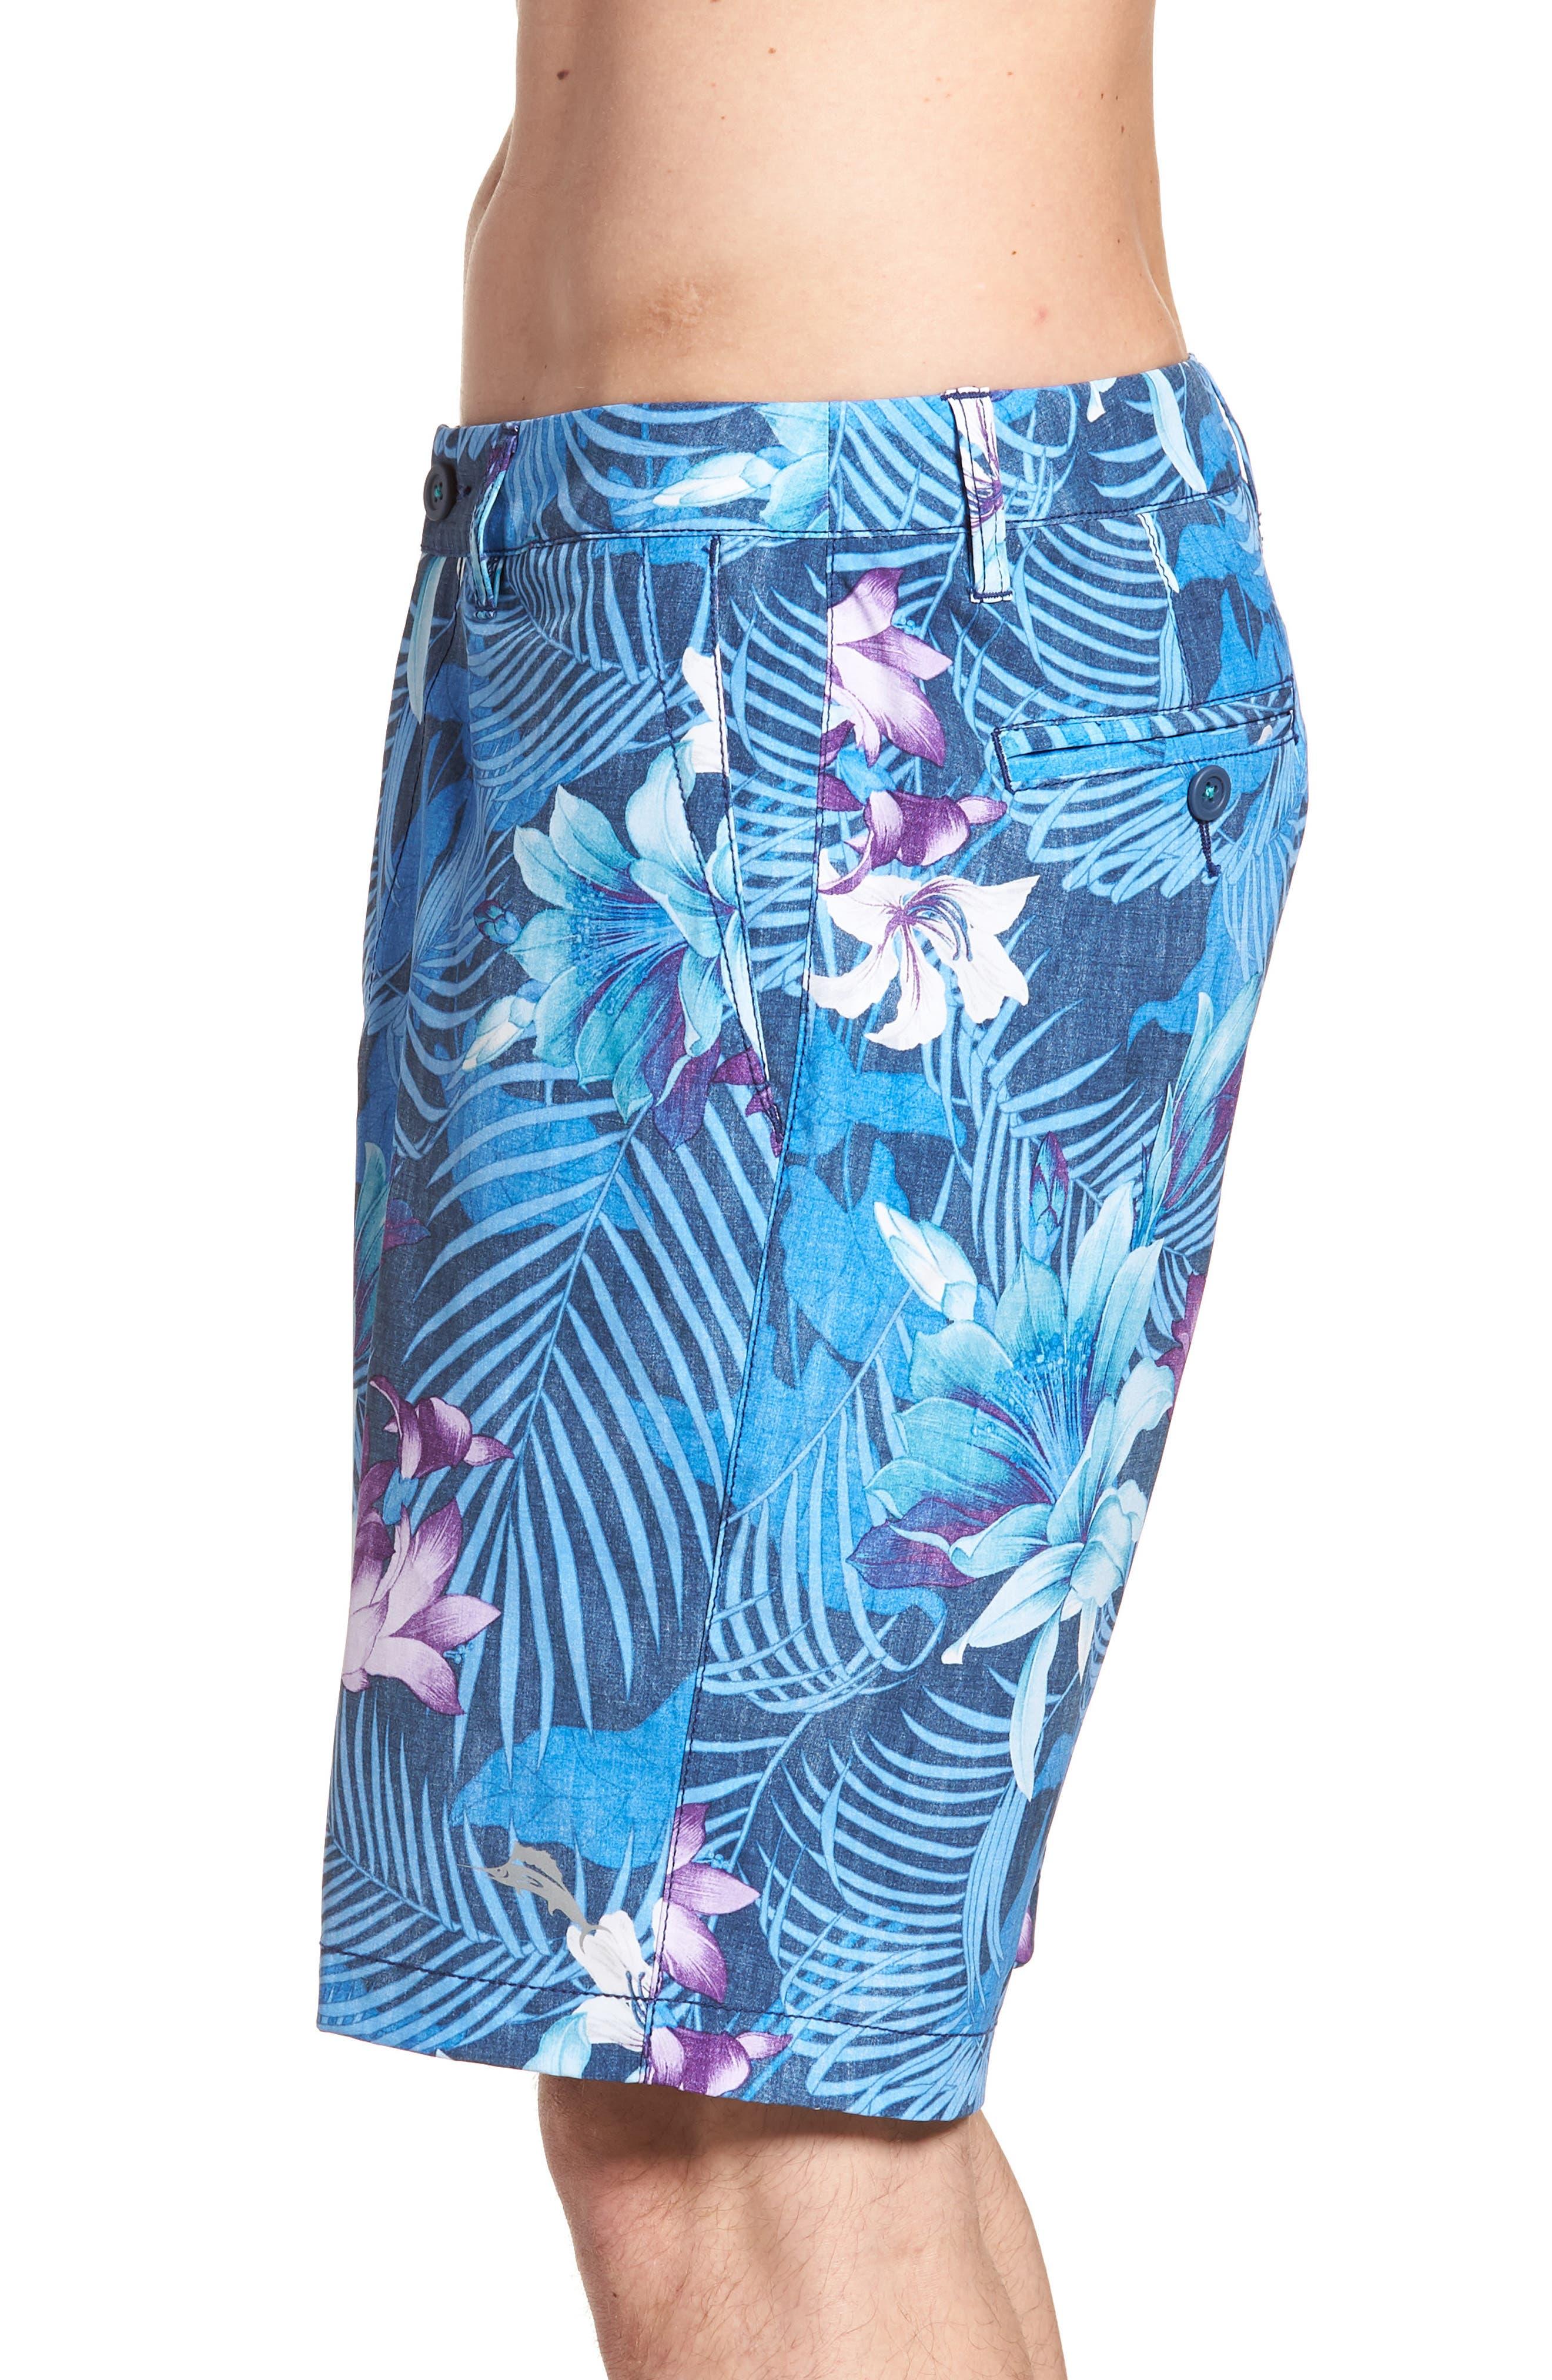 Cayman Laredo Blooms Board Shorts,                             Alternate thumbnail 3, color,                             400